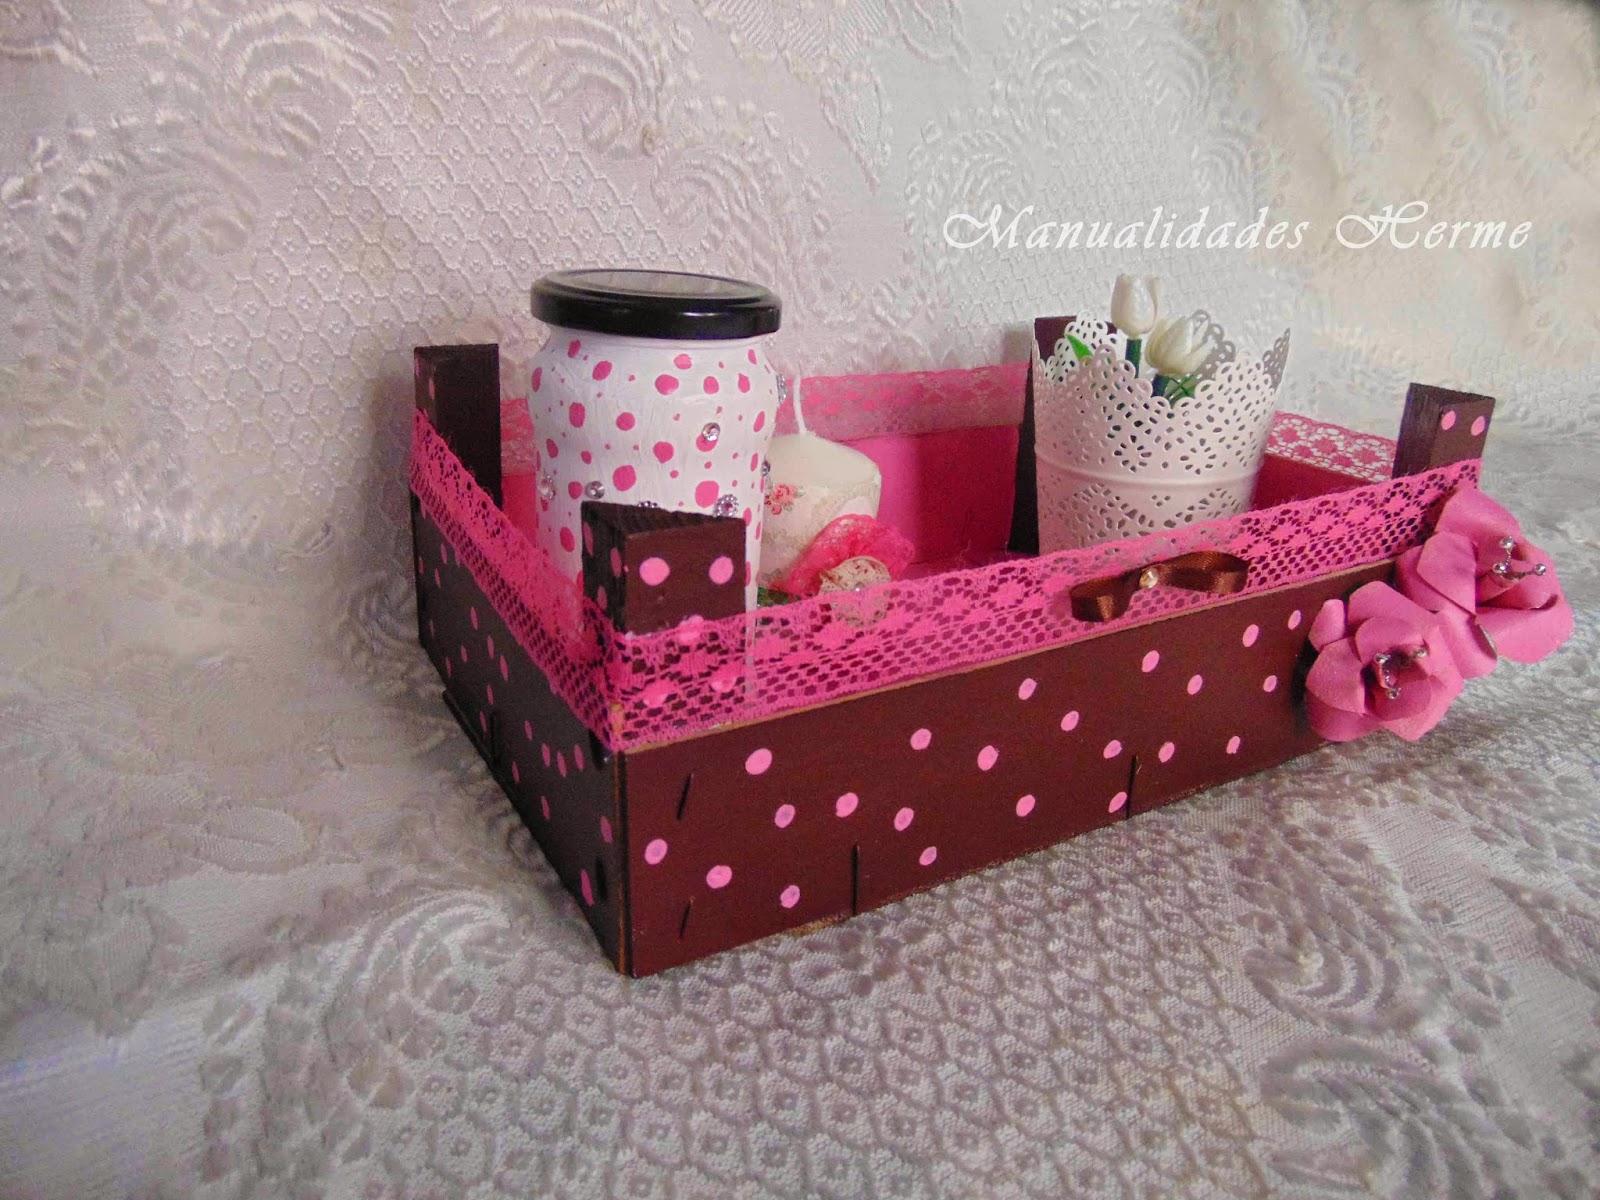 Manualidades herme diy caja de fruta decorada - Como decorar cajas de madera de fruta ...